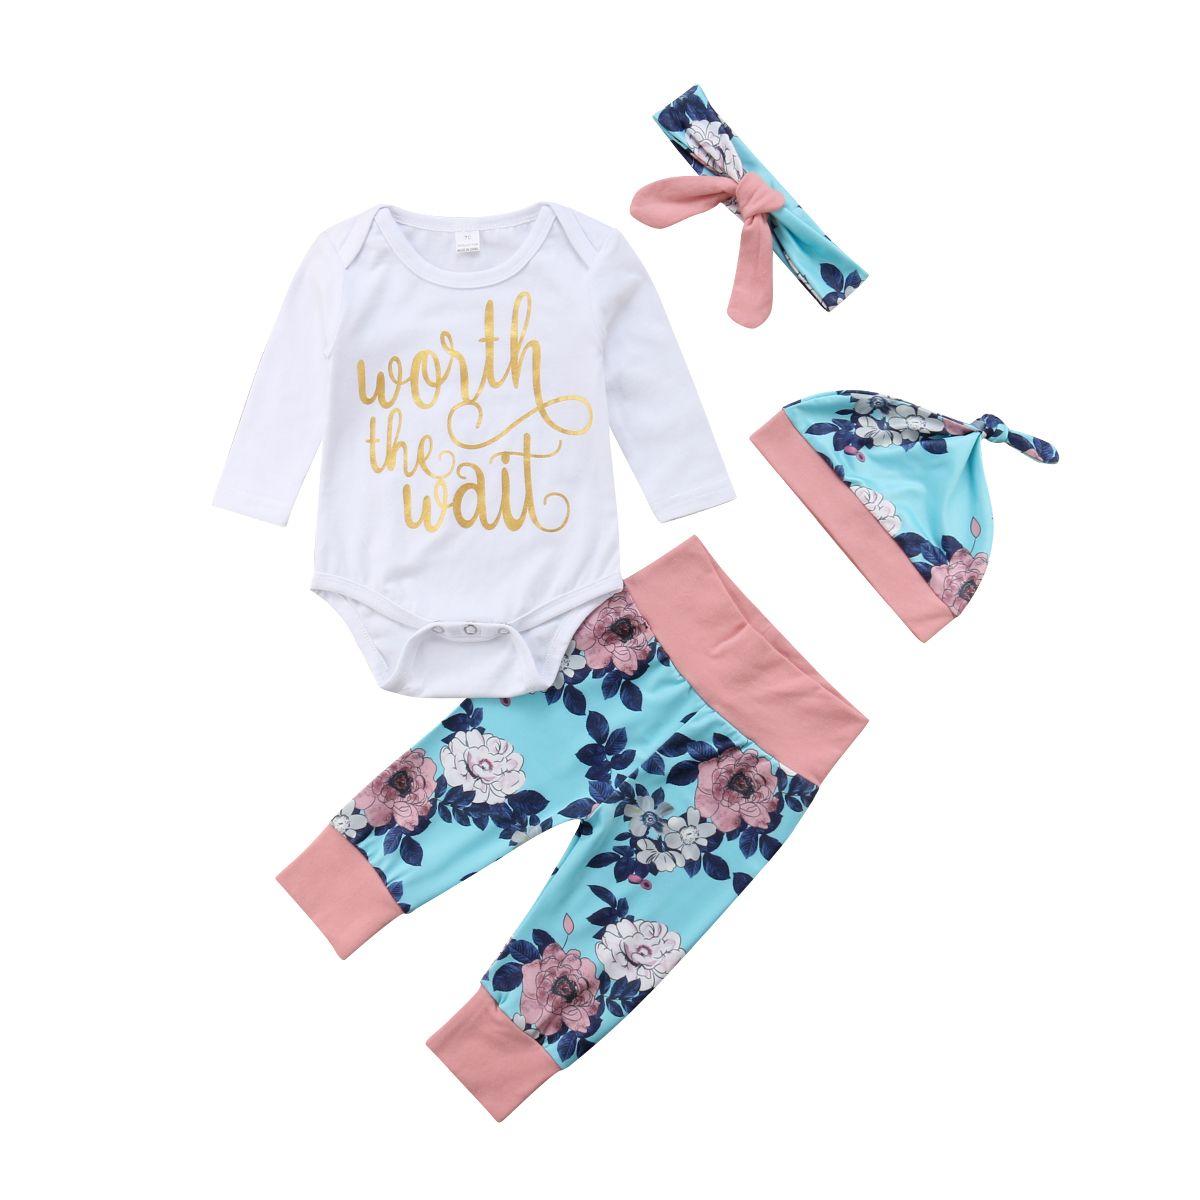 2019 Floral 4PCS Neugeborenes Kind-Baby-Kleidung Overall-Spielanzug-Hosen-Outfit Set